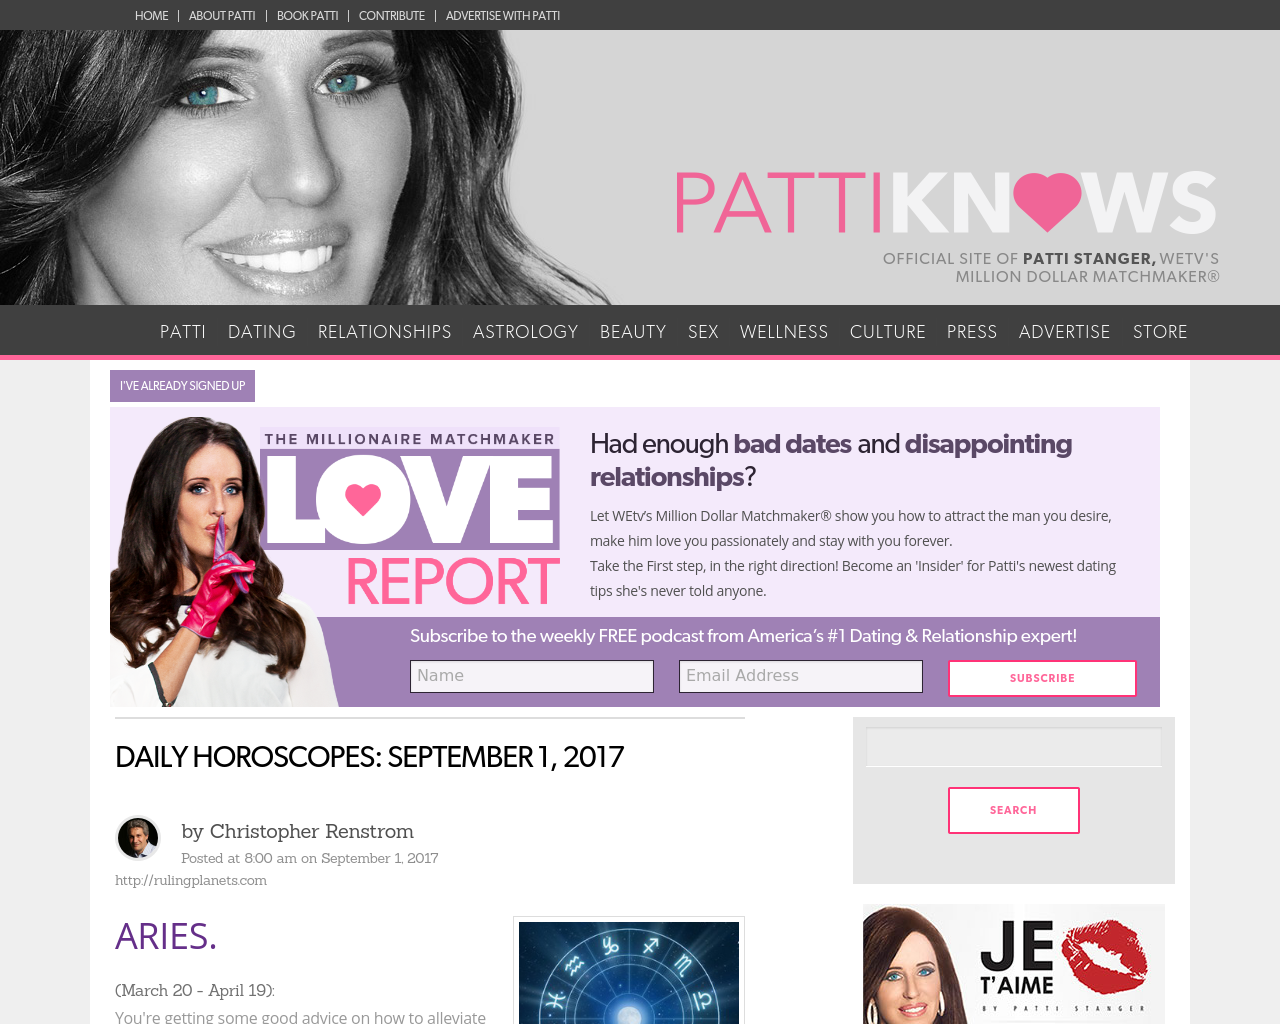 PattiKnows-Advertising-Reviews-Pricing